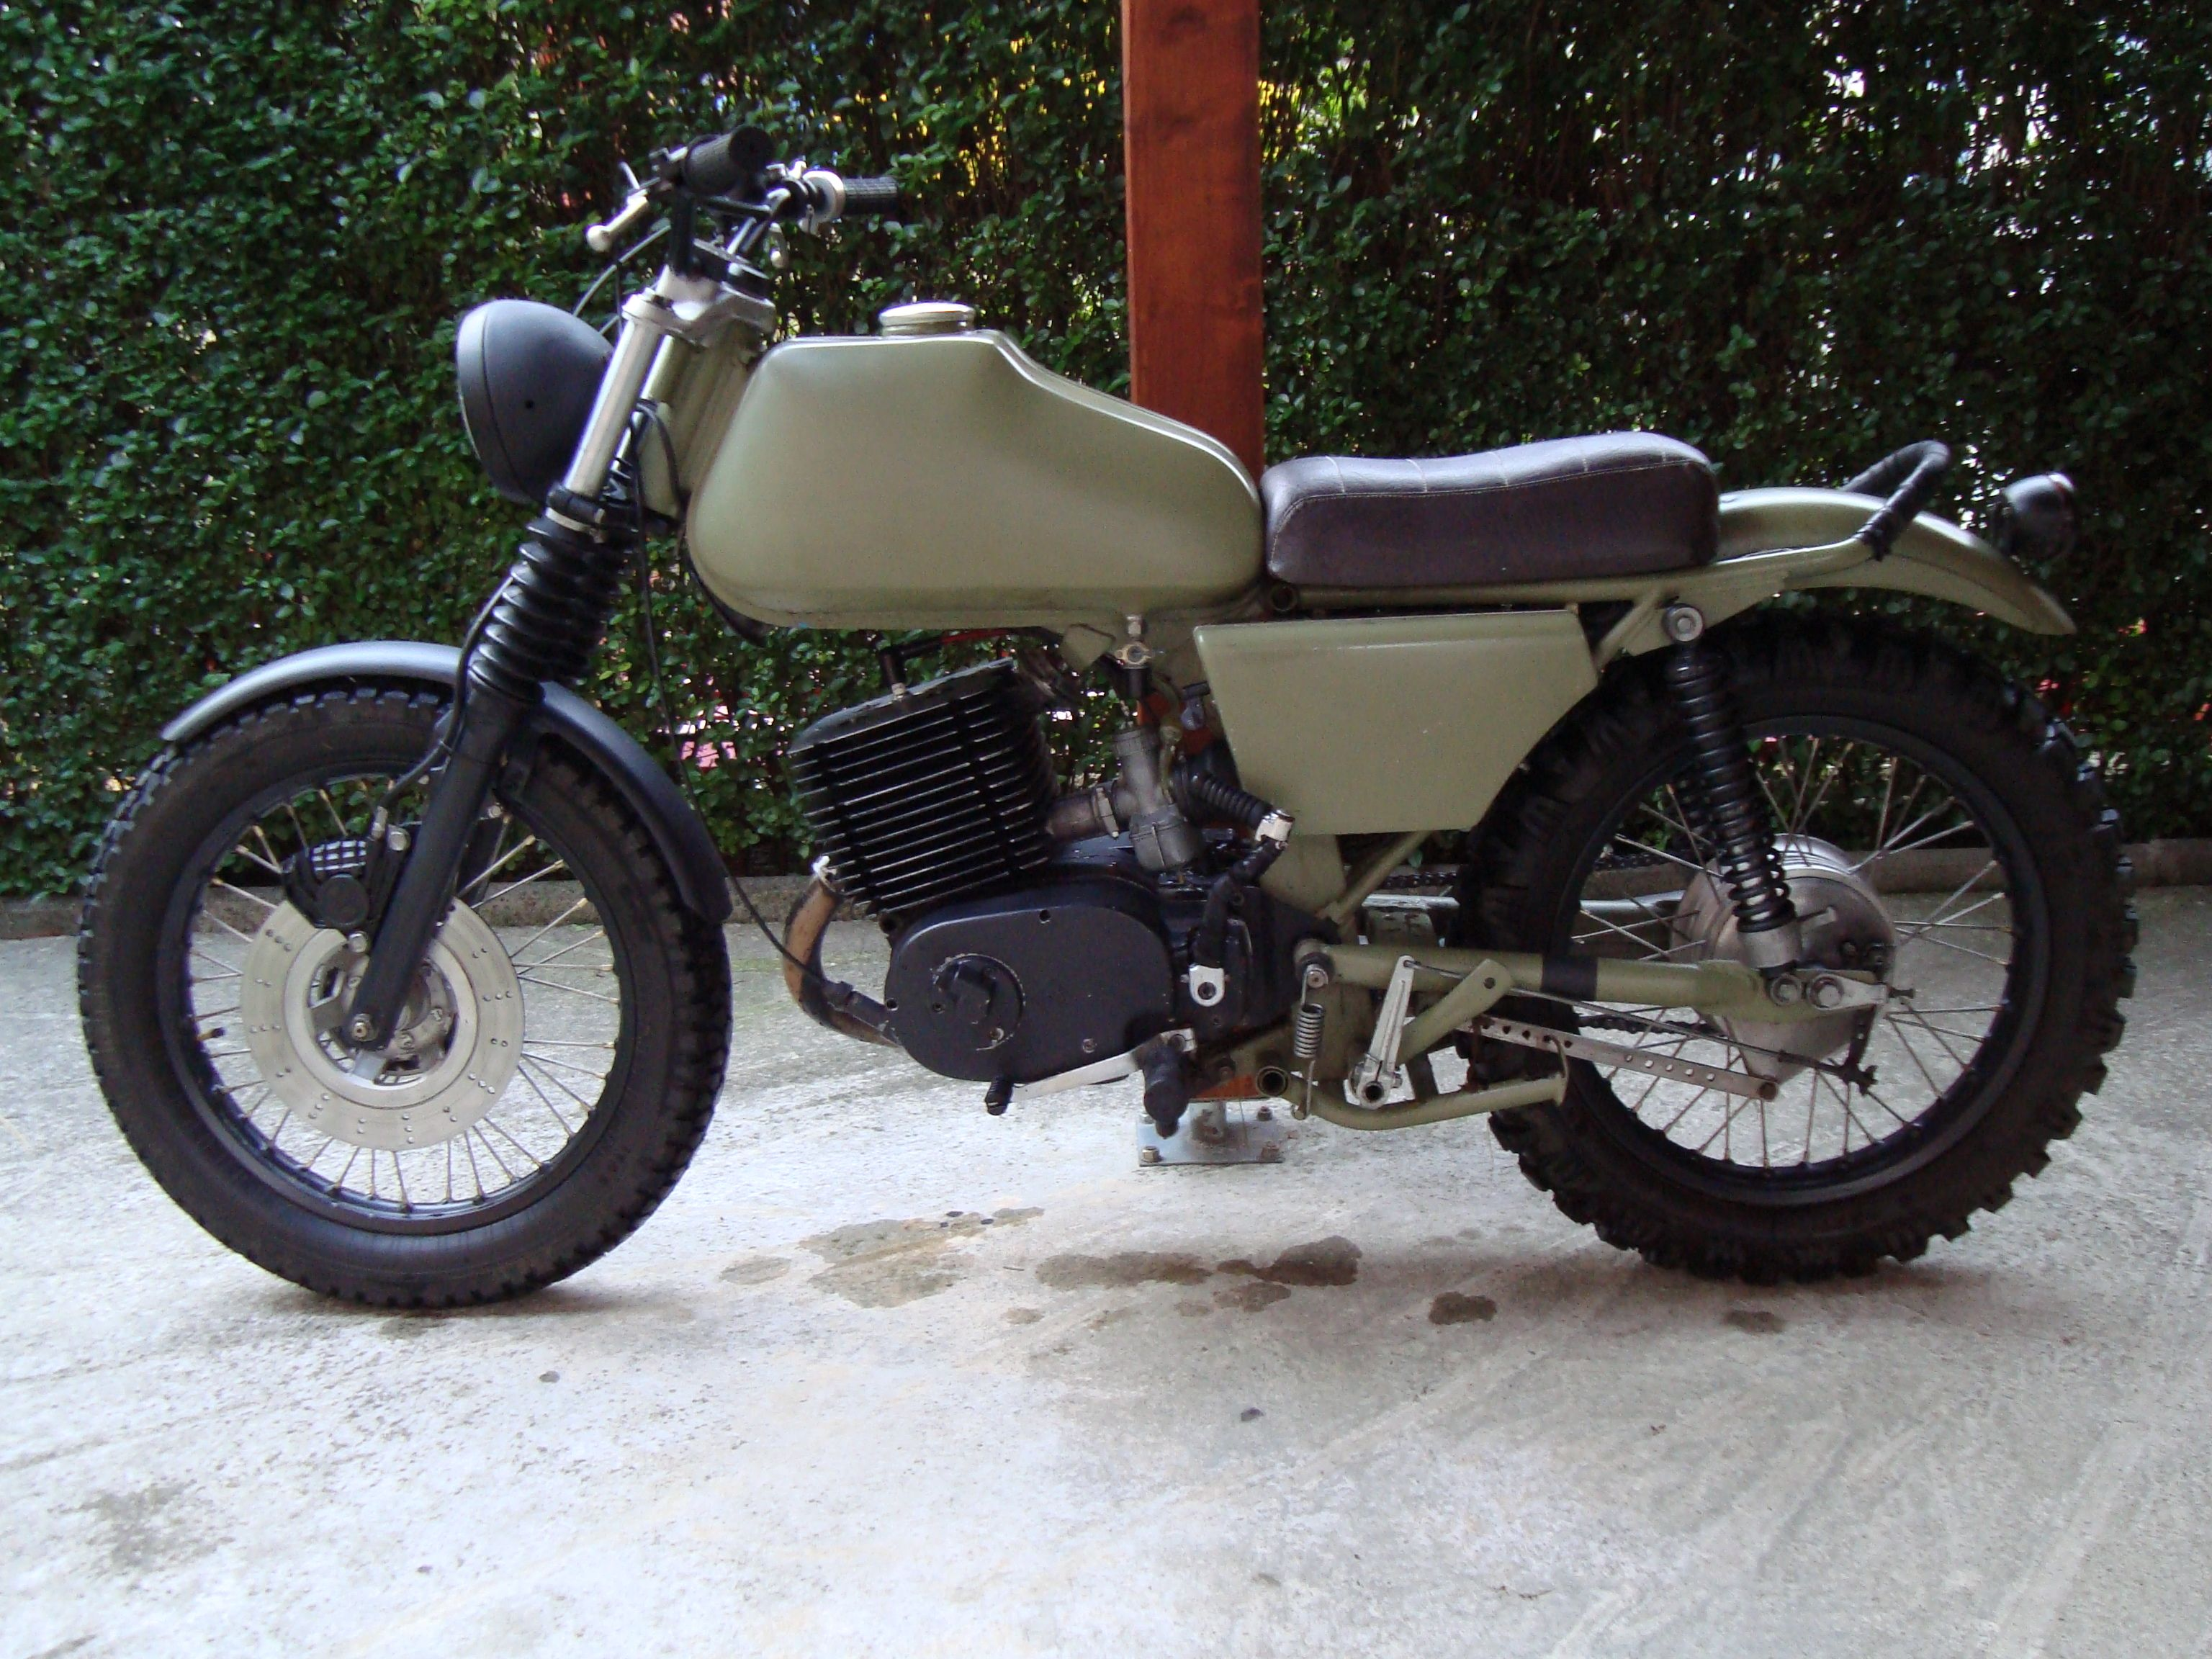 mz etz 250 scrambler mz bmw motorrad motorrad und fahrrad. Black Bedroom Furniture Sets. Home Design Ideas